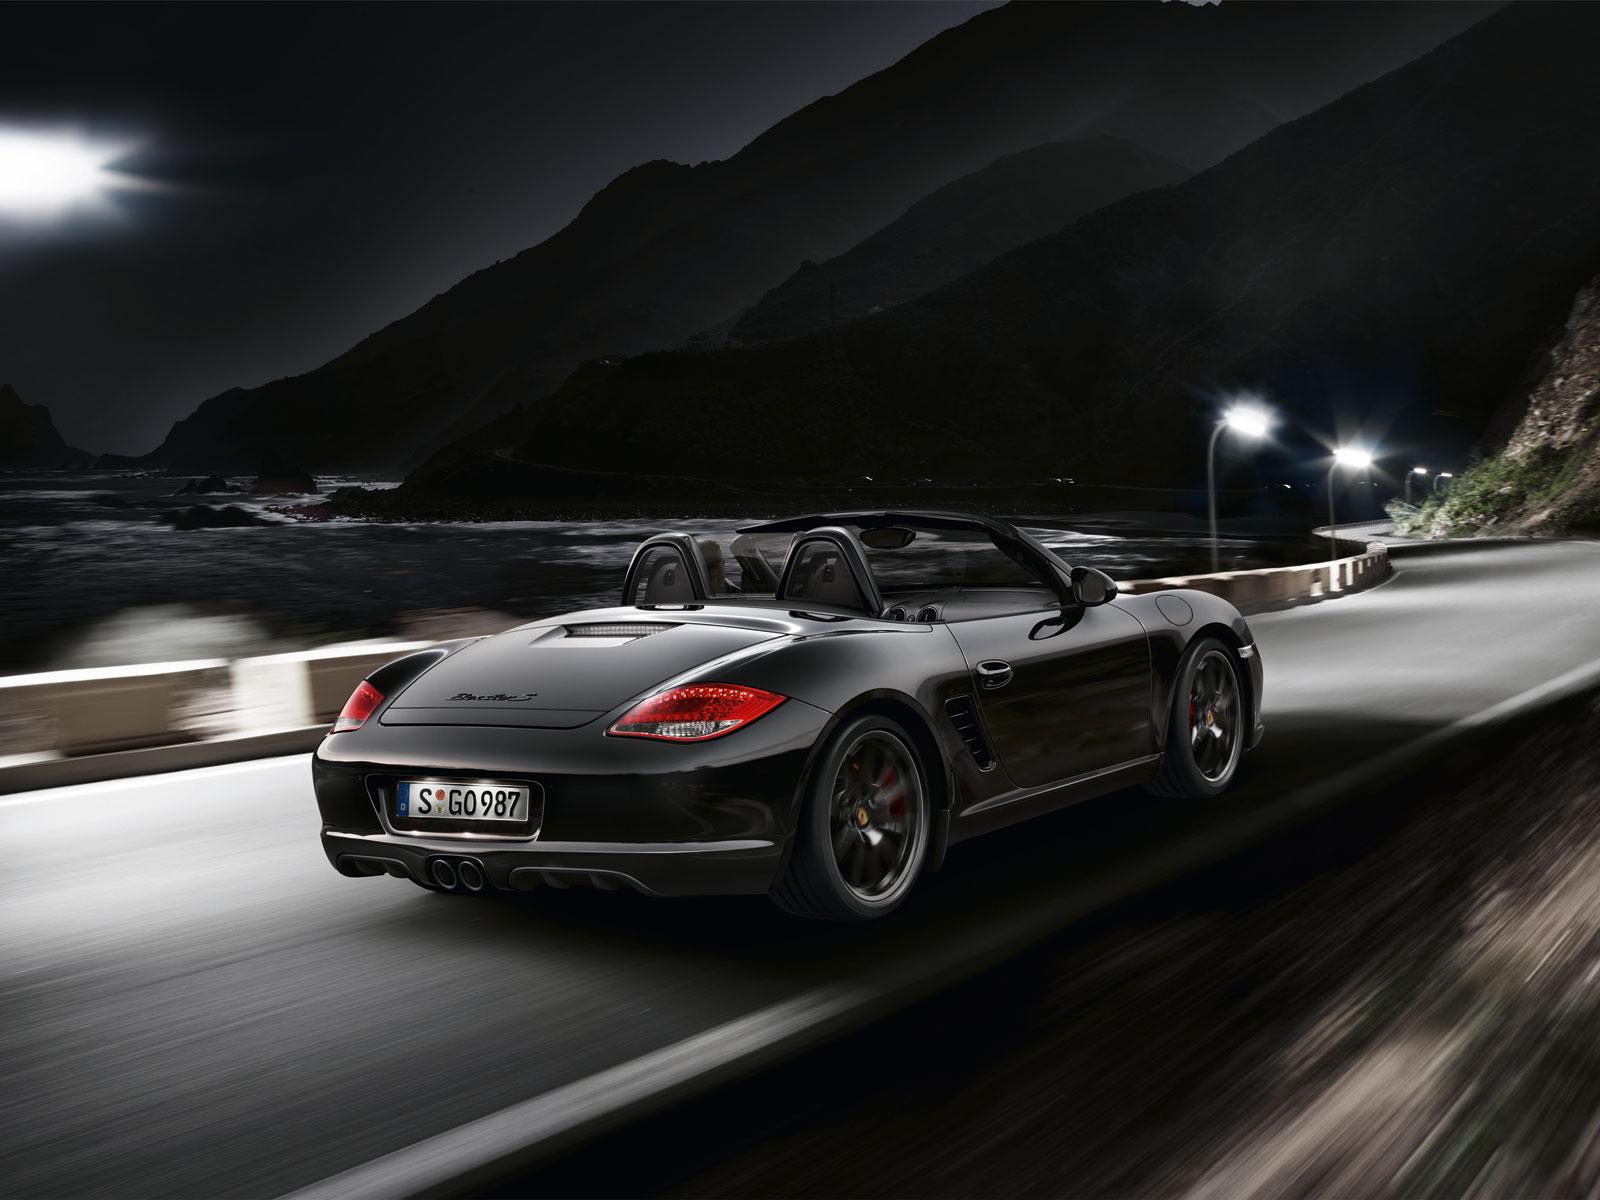 Porsche Boxster S Black Edition Has More Features More Value And More Horsepower European Car Magazine